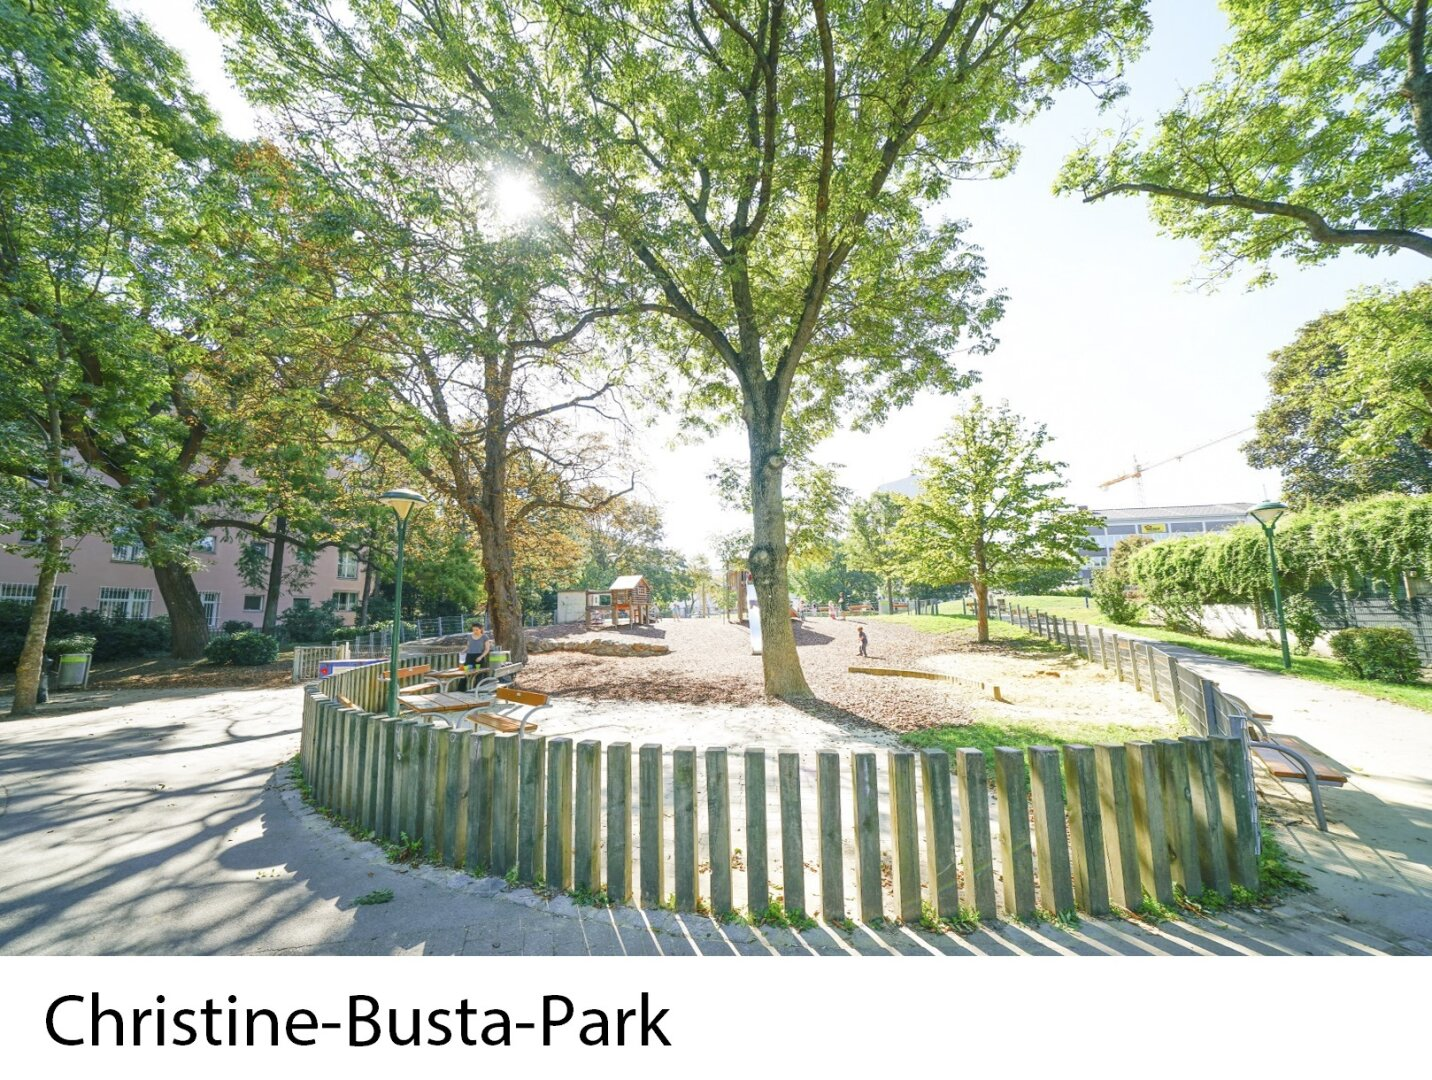 Christine-Busta-Park